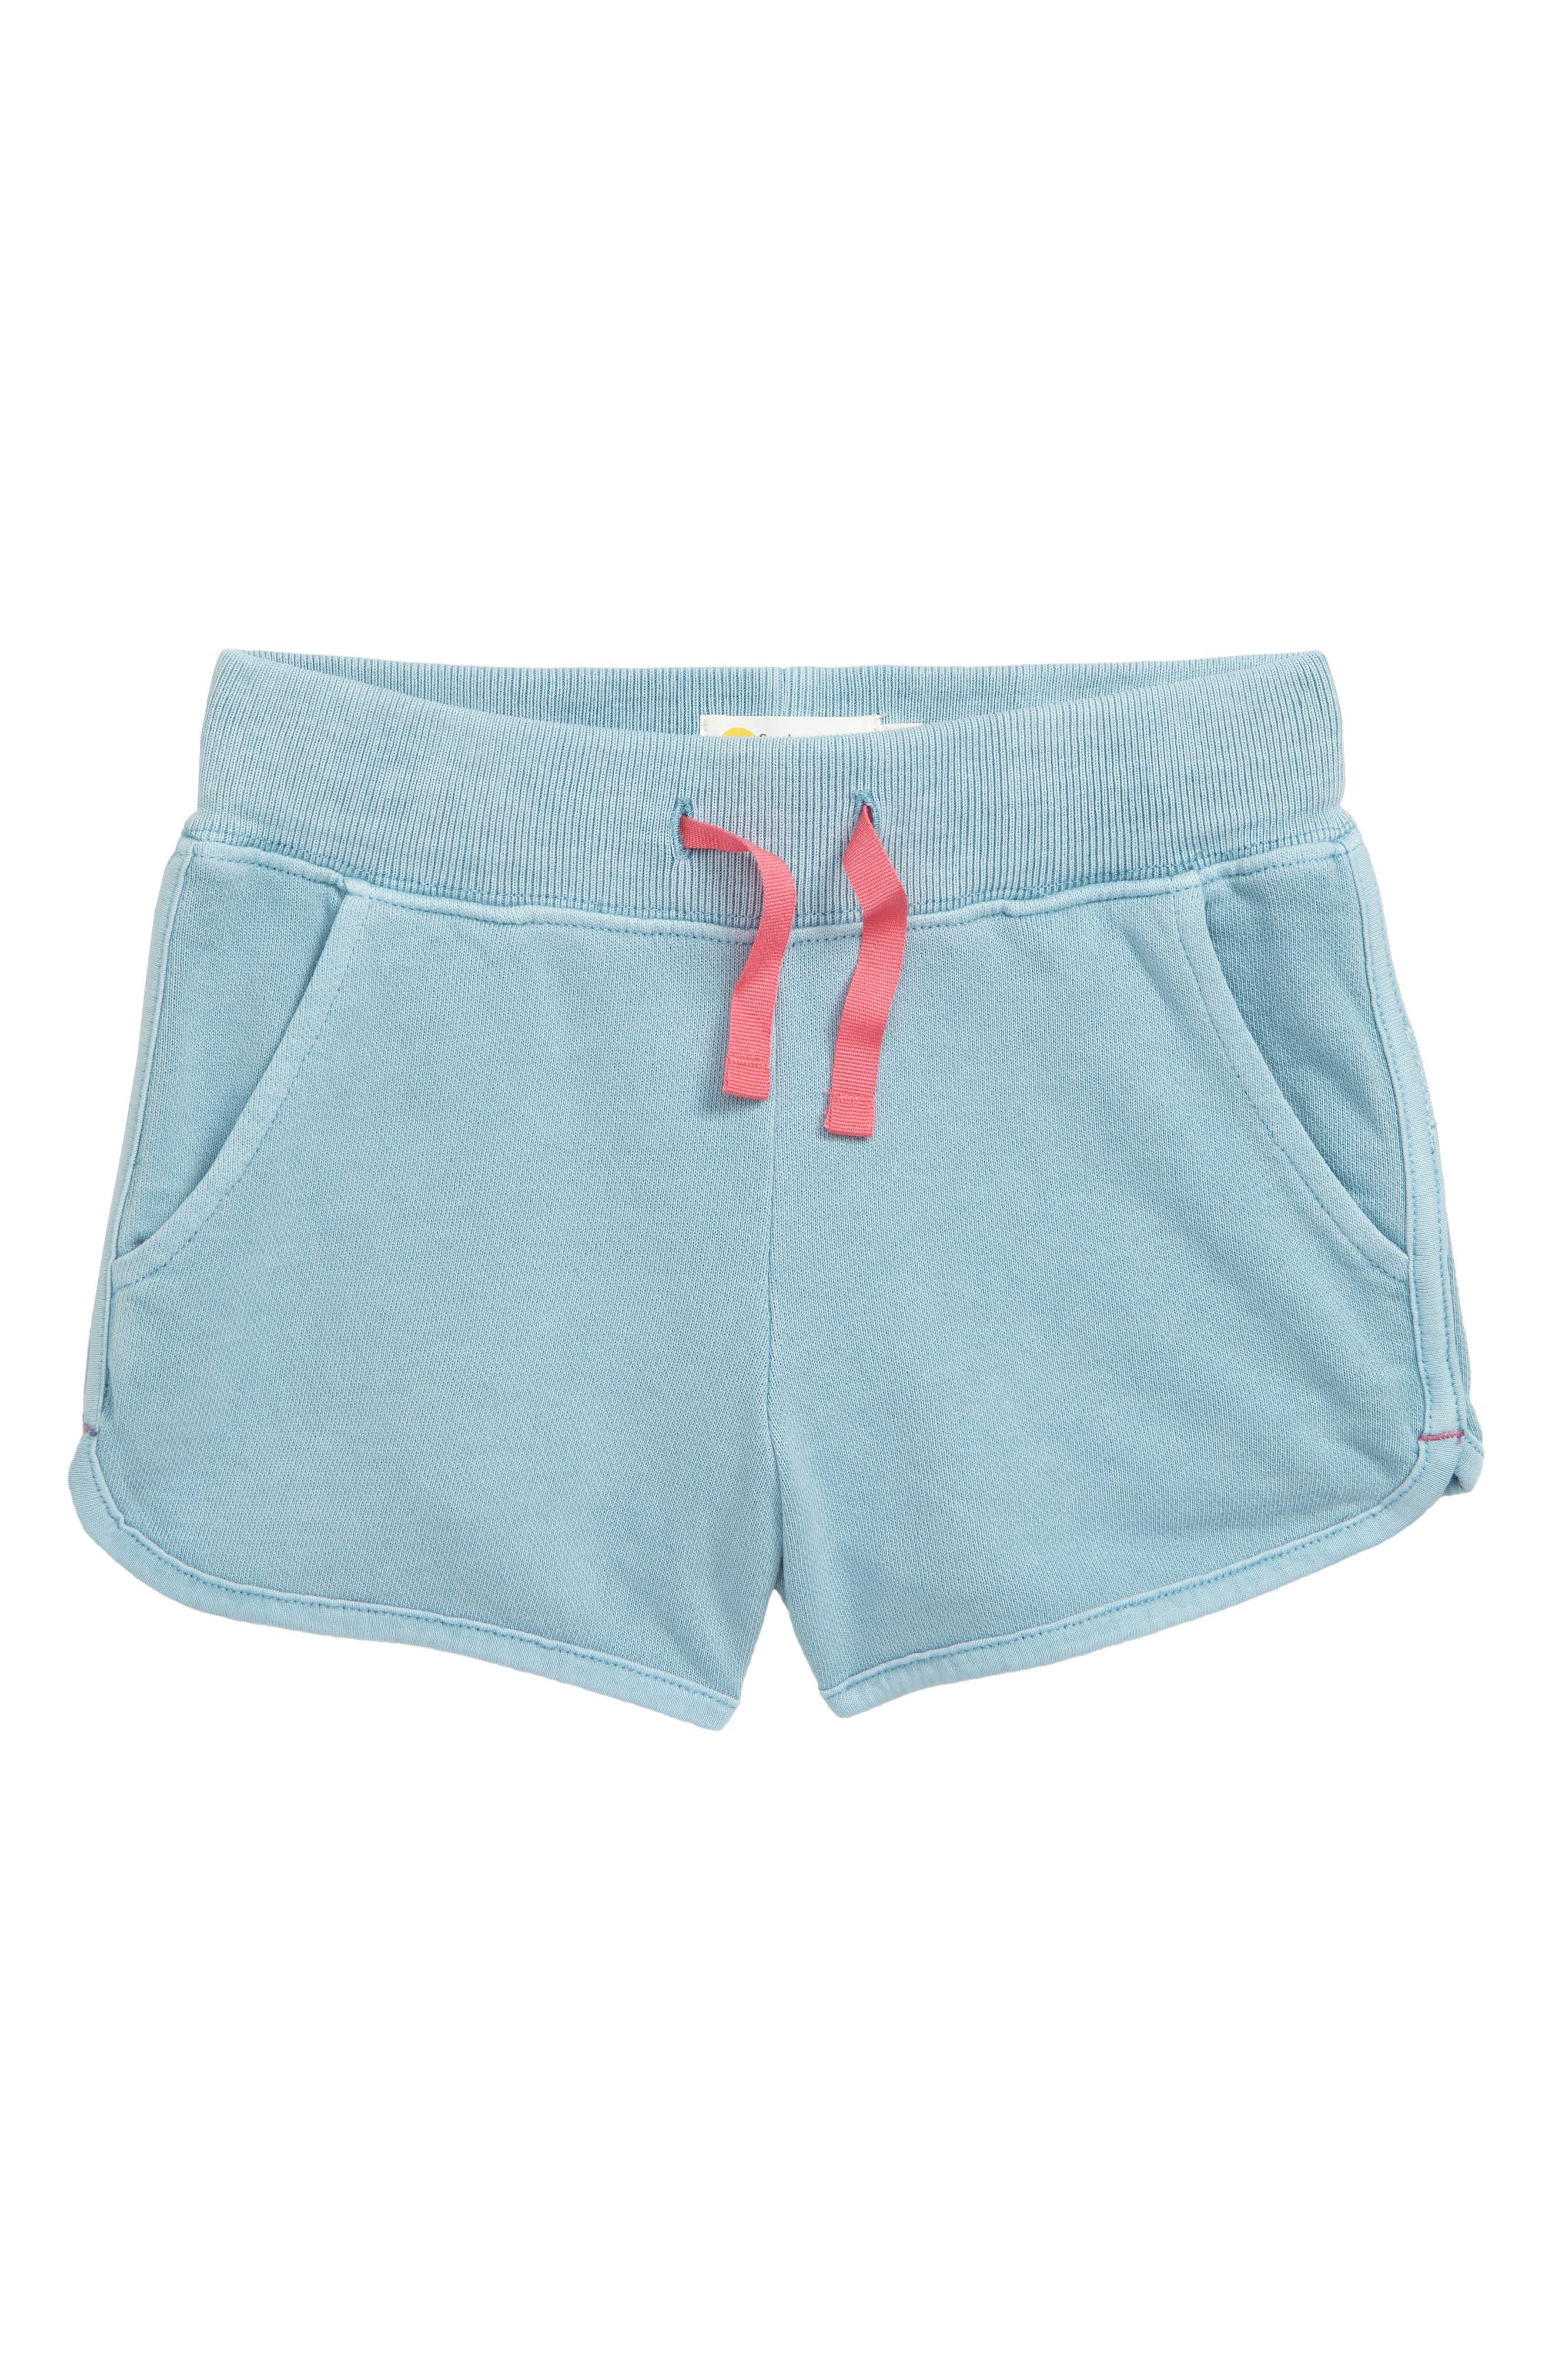 Garment Dye Jersey Shorts, Main, color, SBL MINERAL BLUE